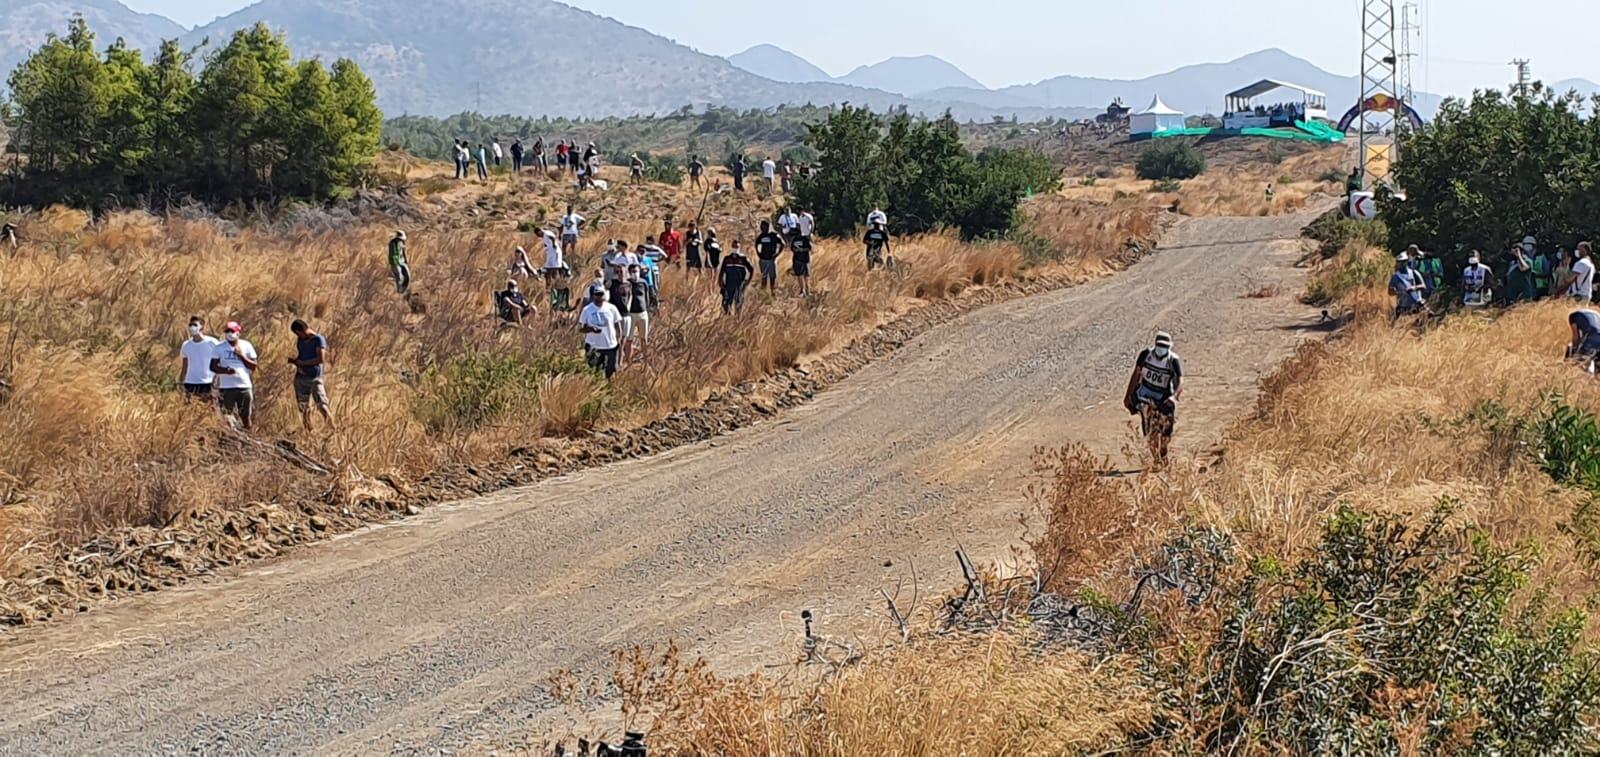 WRC: Marmaris Rally Turkey [18-20 Septiembre] - Página 3 EiREE9MWkAECCbW?format=jpg&name=large